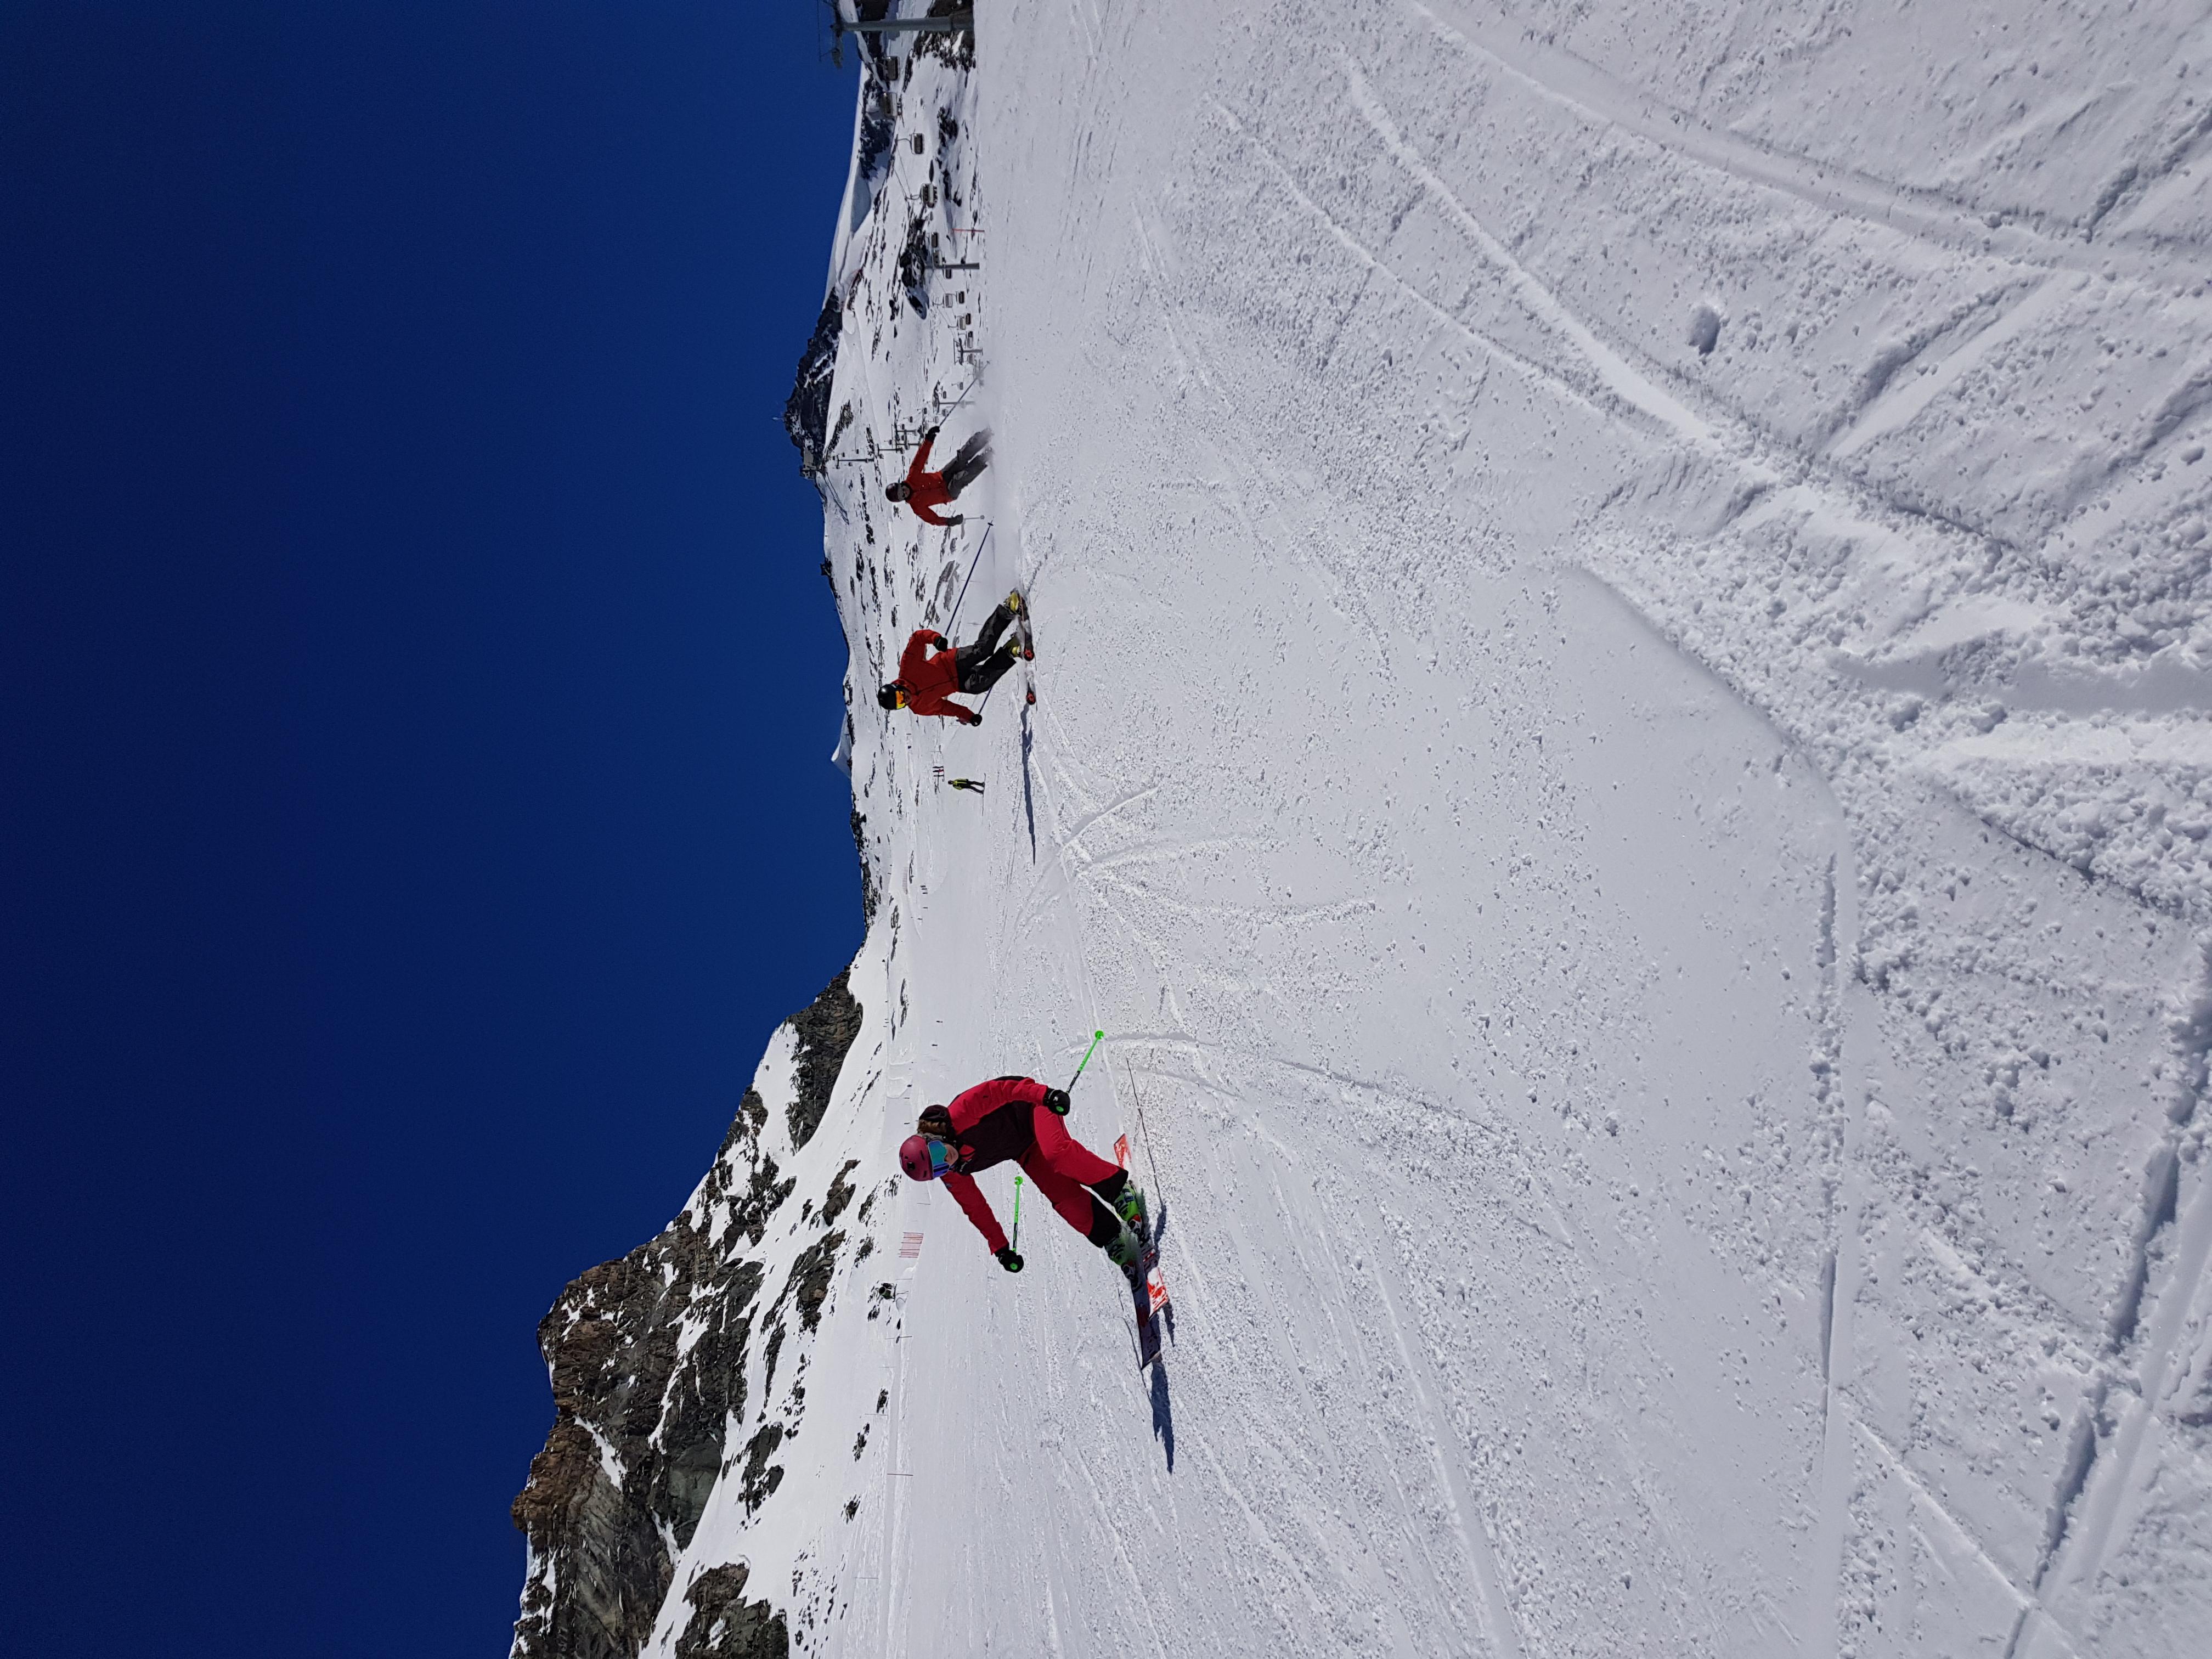 Evolution Ski School Zermatt- Matterhorn